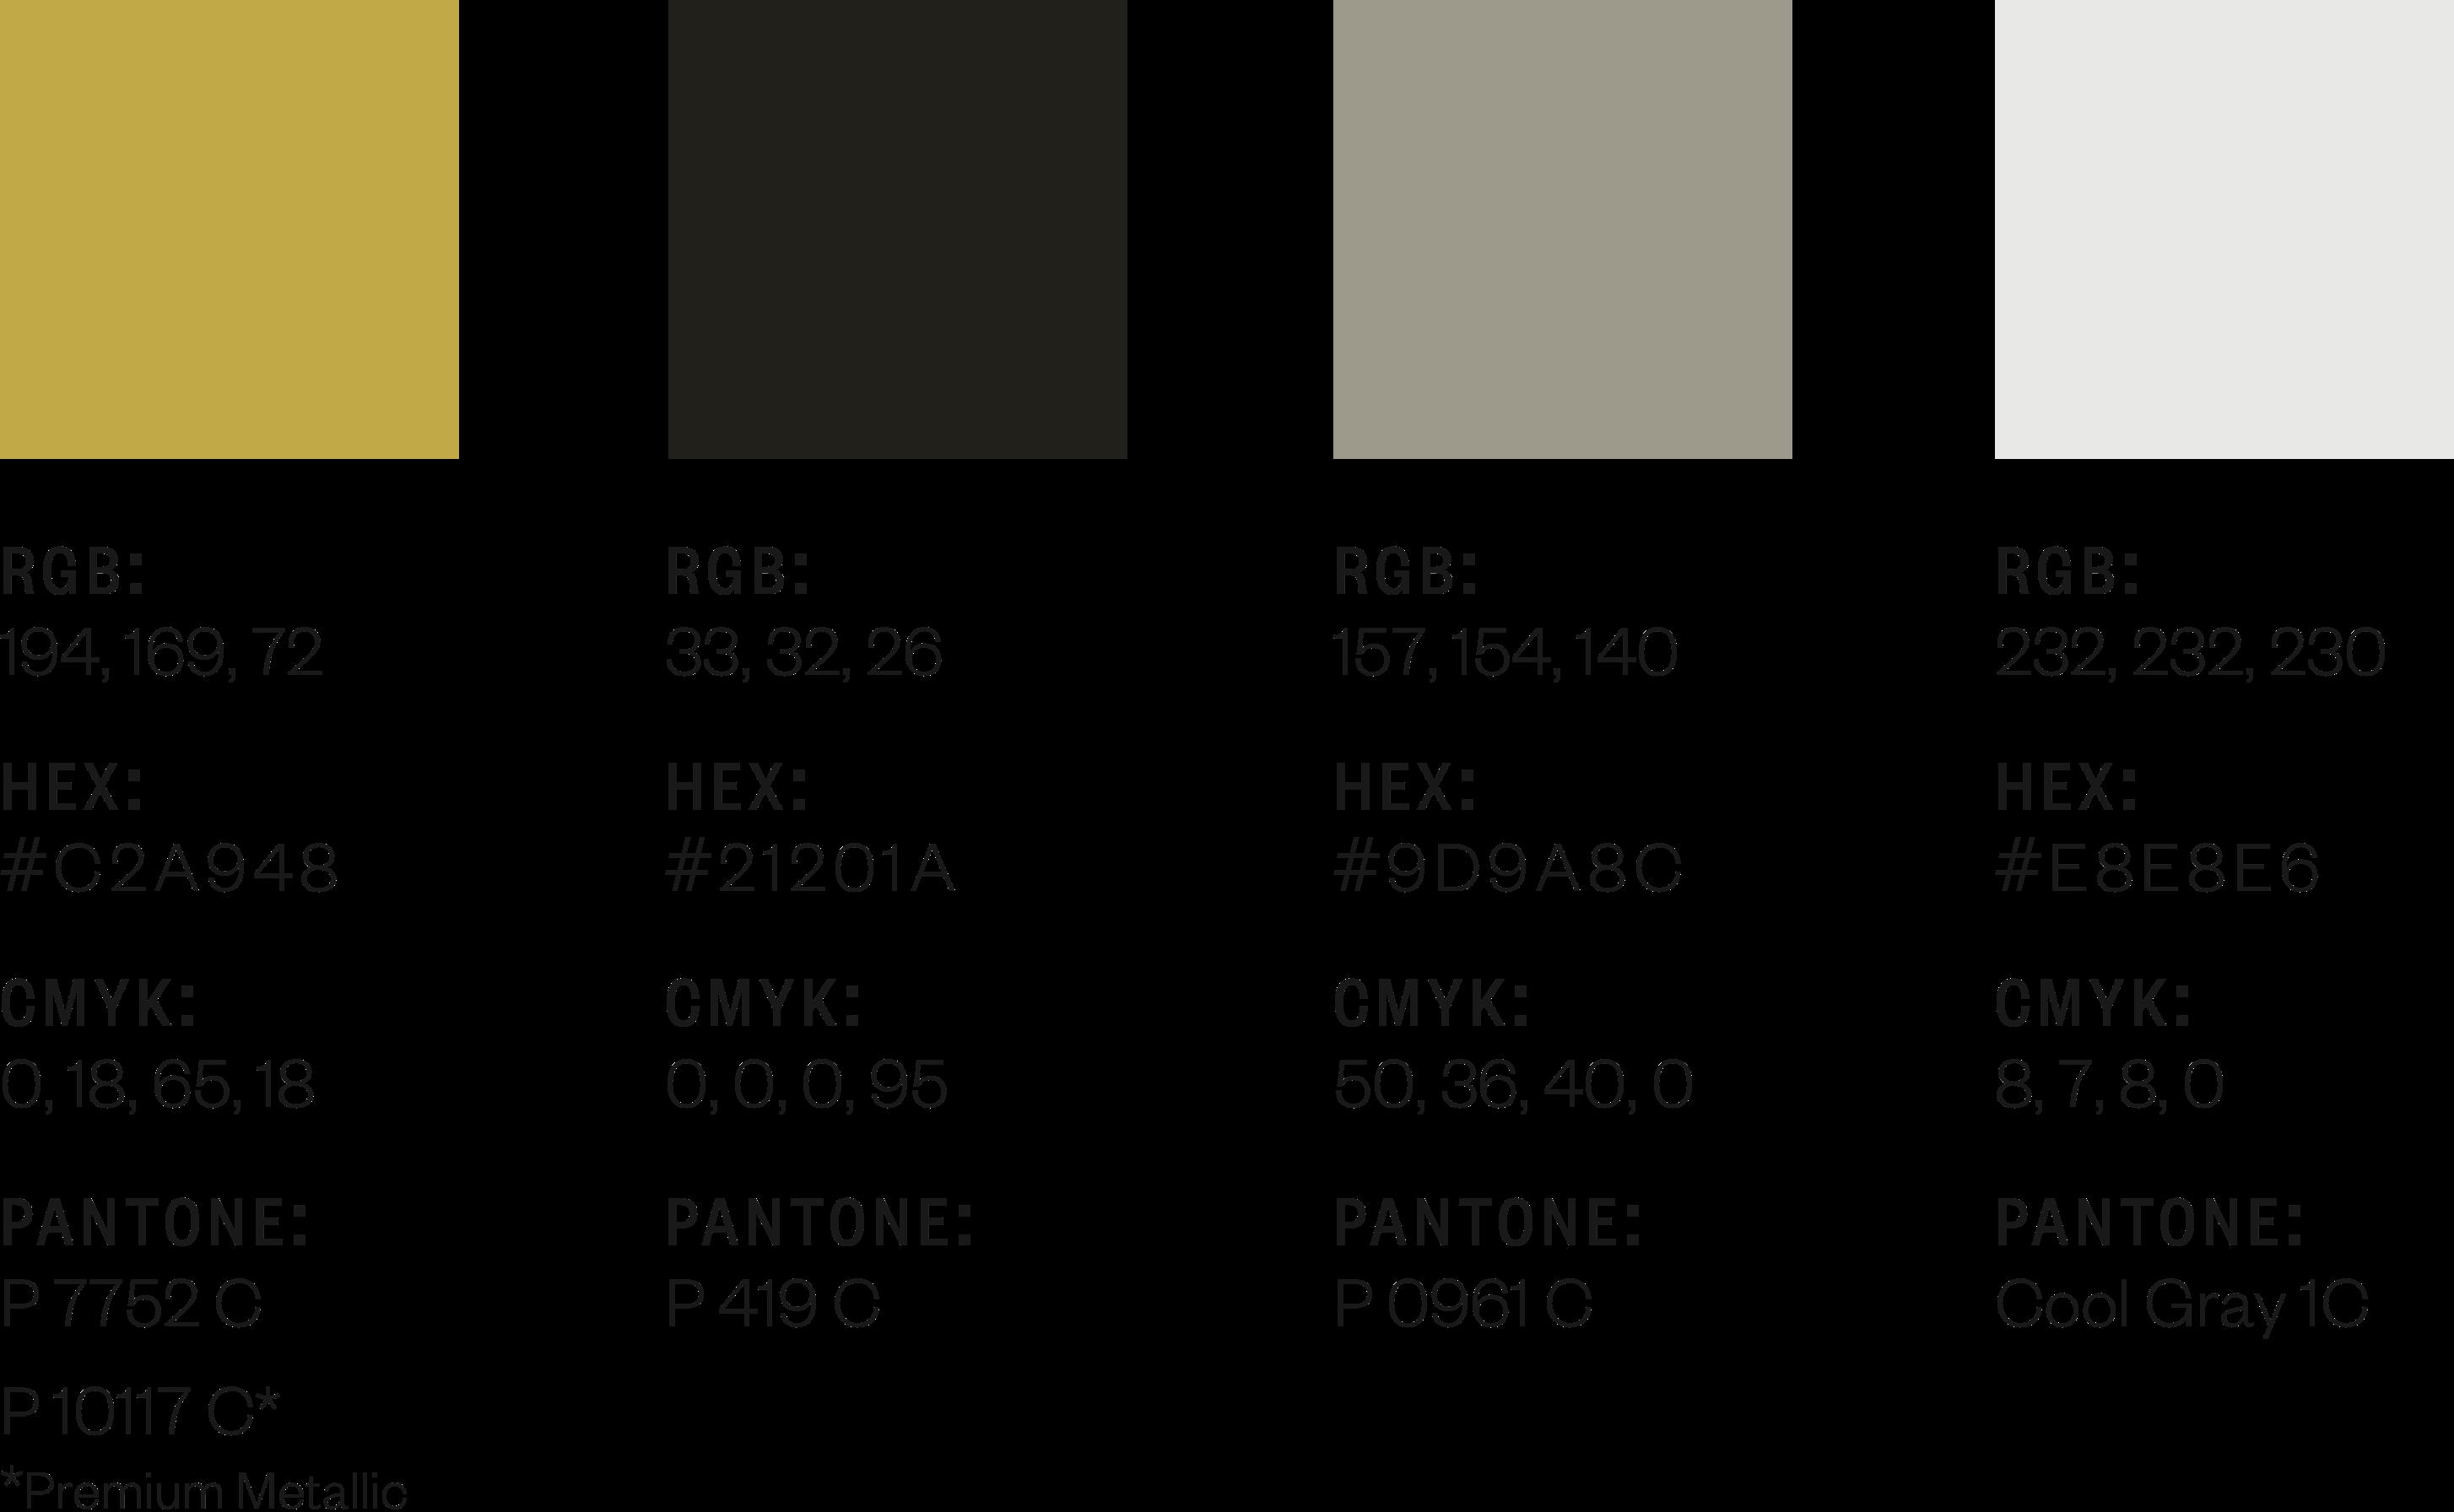 antiche-colors